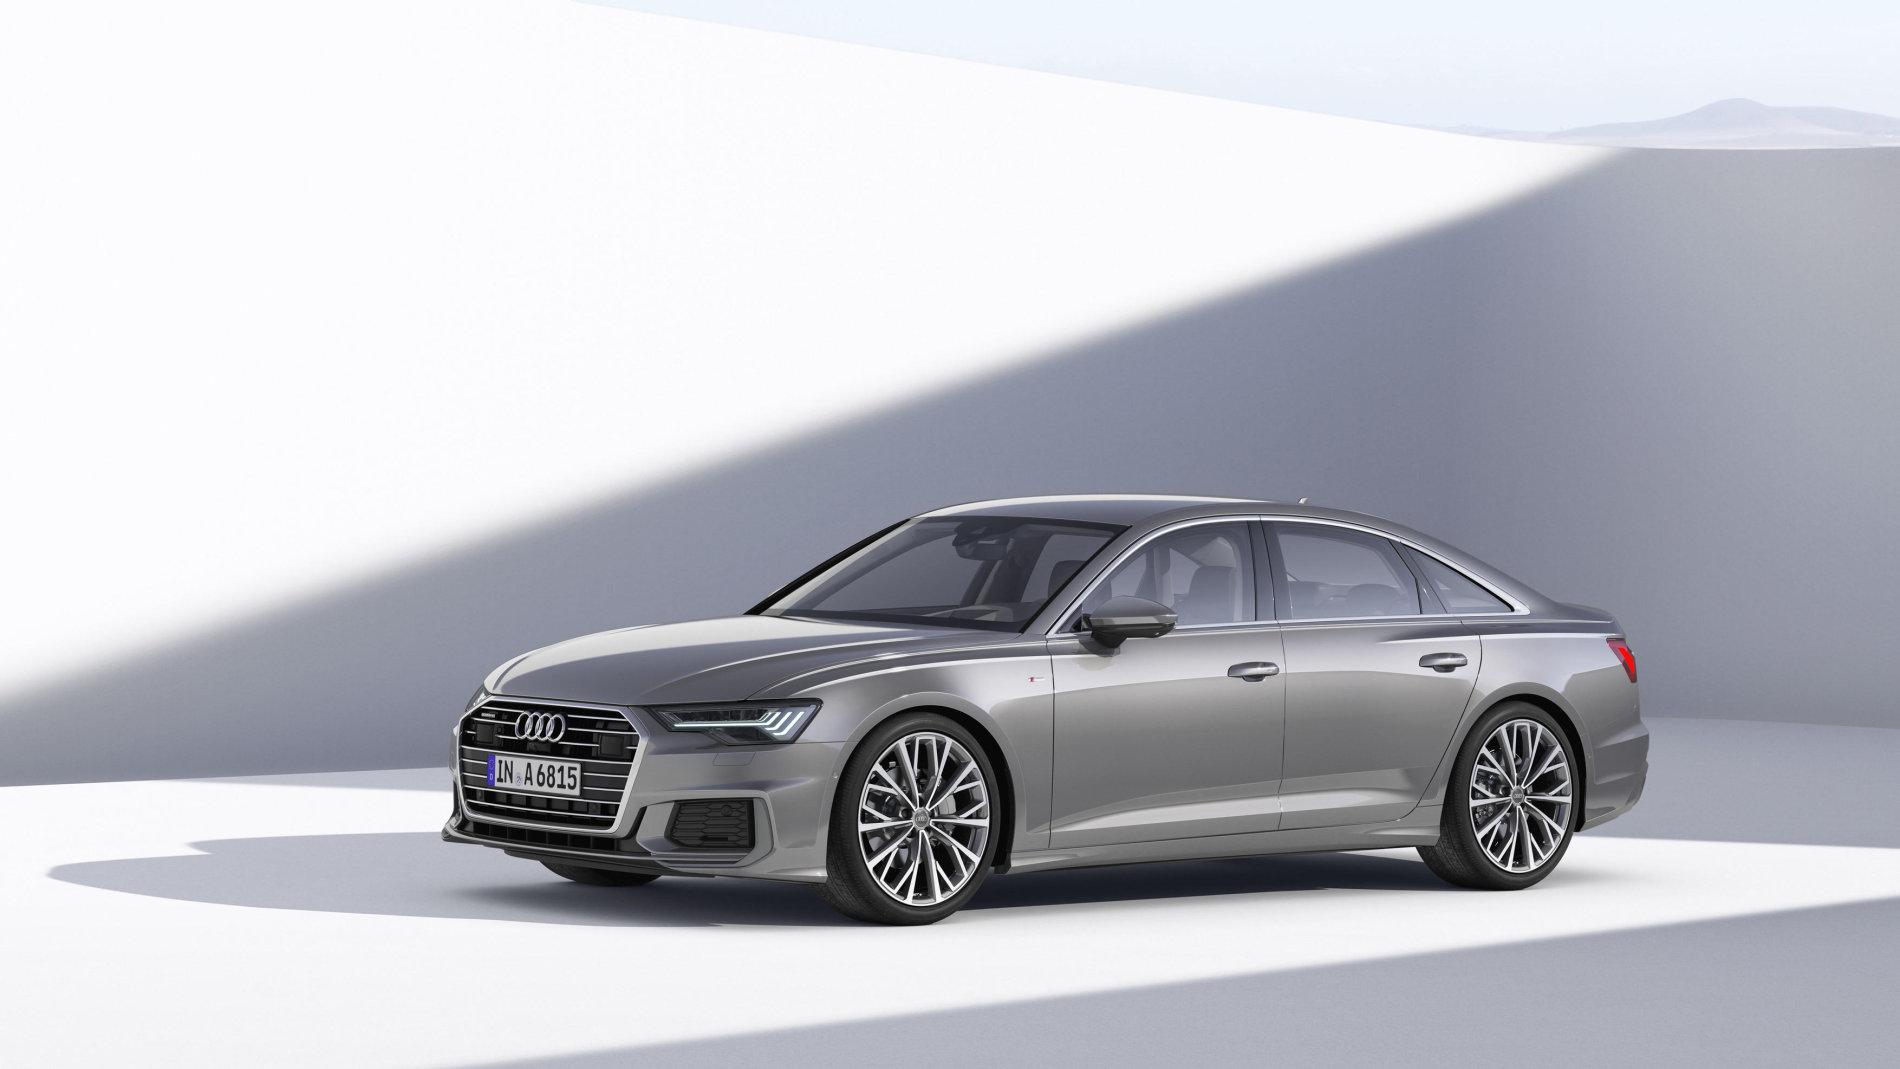 Noul Audi A6 - Galerie Foto - Noul Audi A6 - Galerie Foto